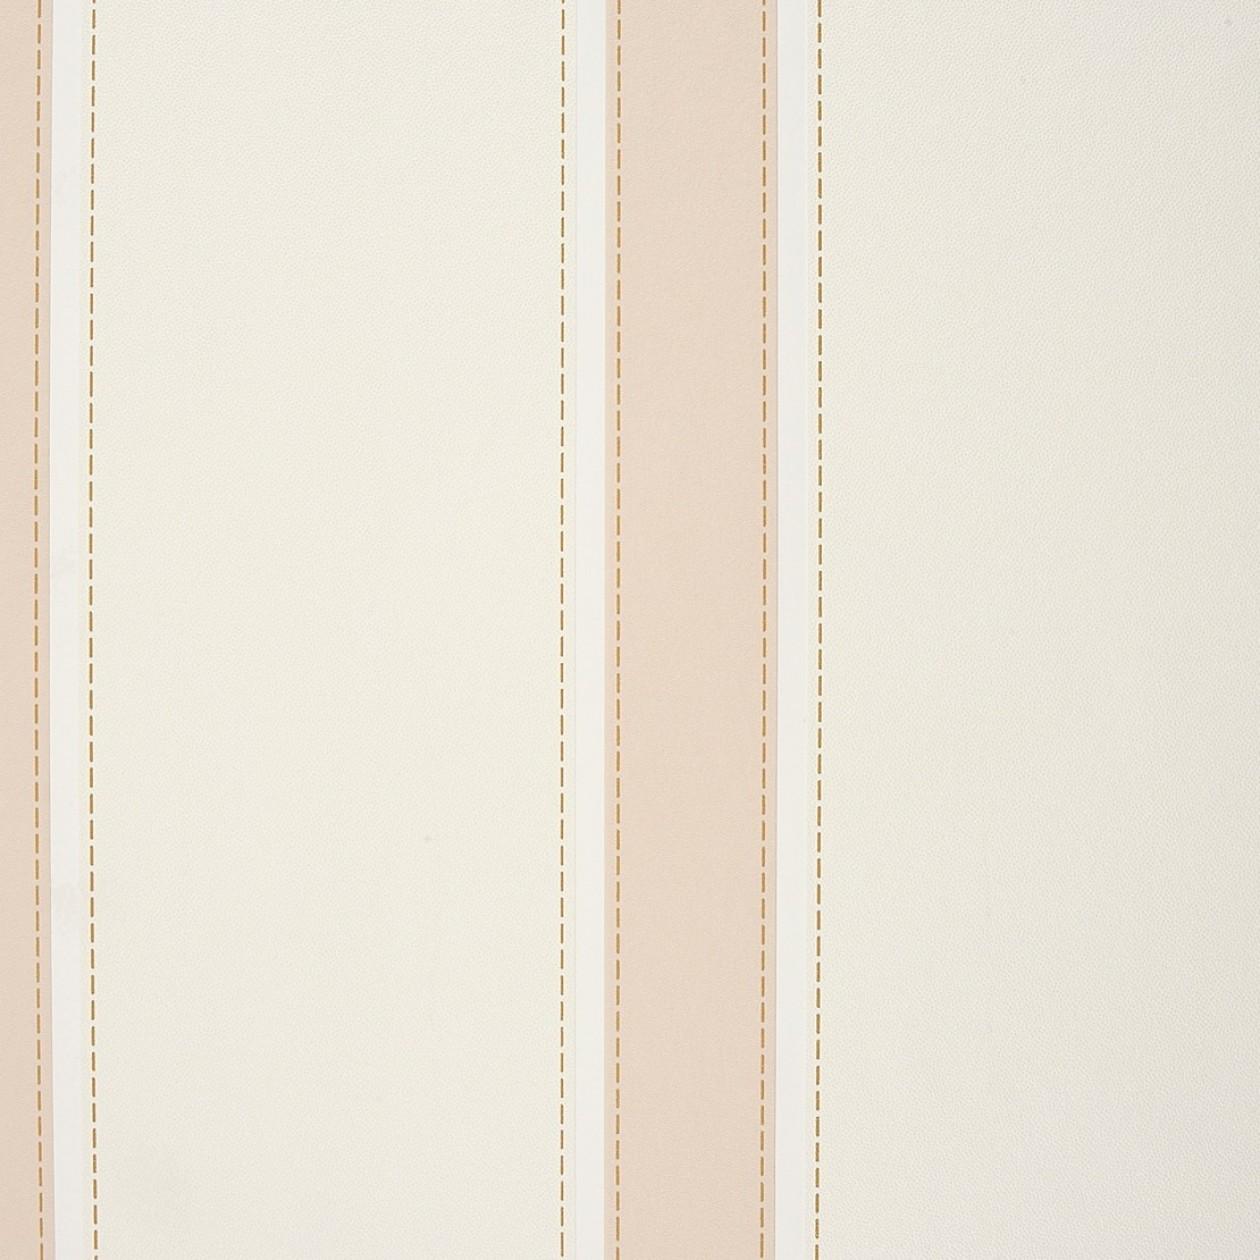 Французские обои Caselio,  коллекция Elegante, артикулELG60522016